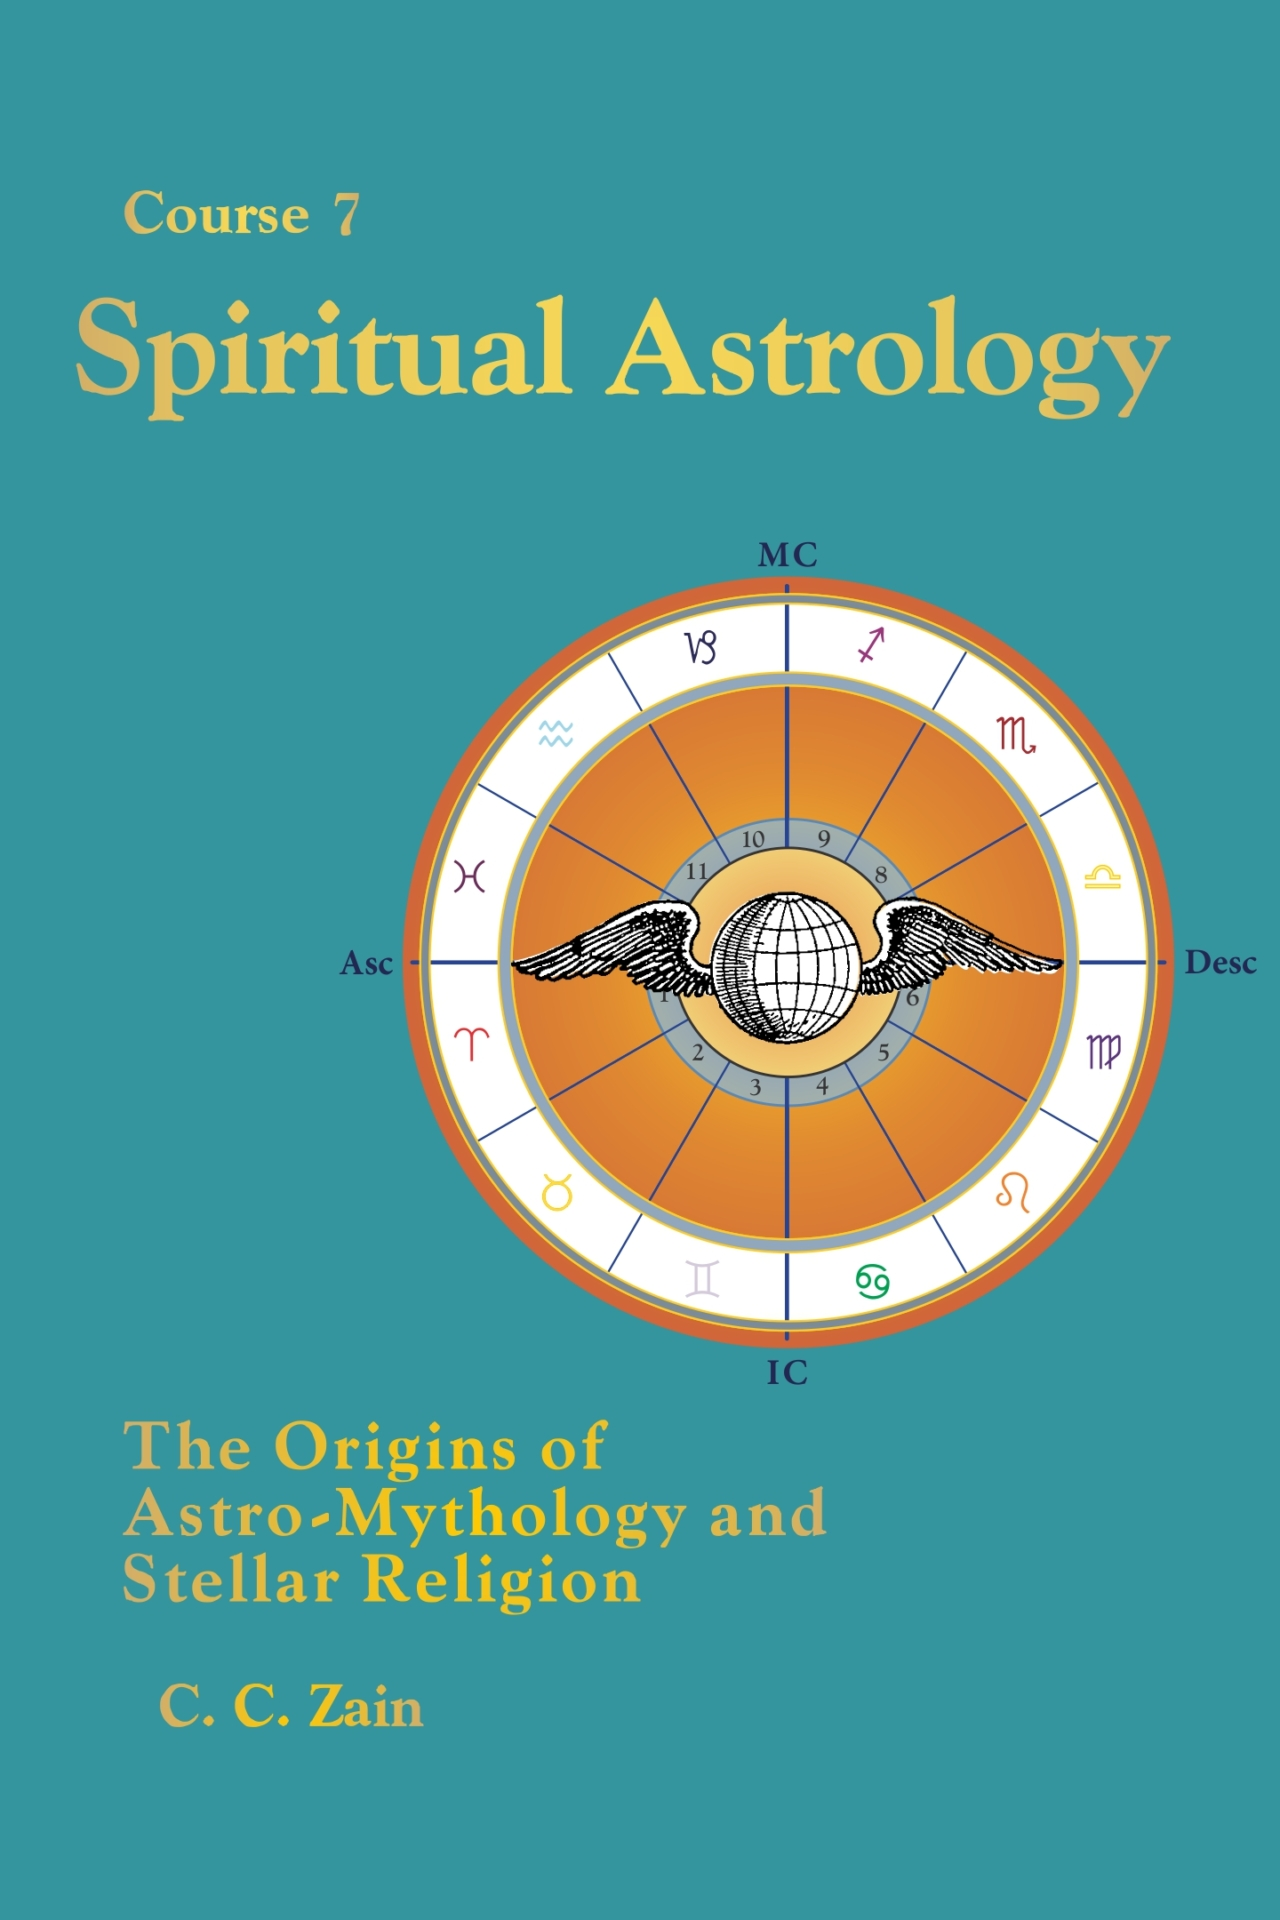 https://study.academyofhermeticarts.org/wp-content/uploads/2020/04/07_Spiritual_Astrology_eBook_Cover-1280x1920.jpg